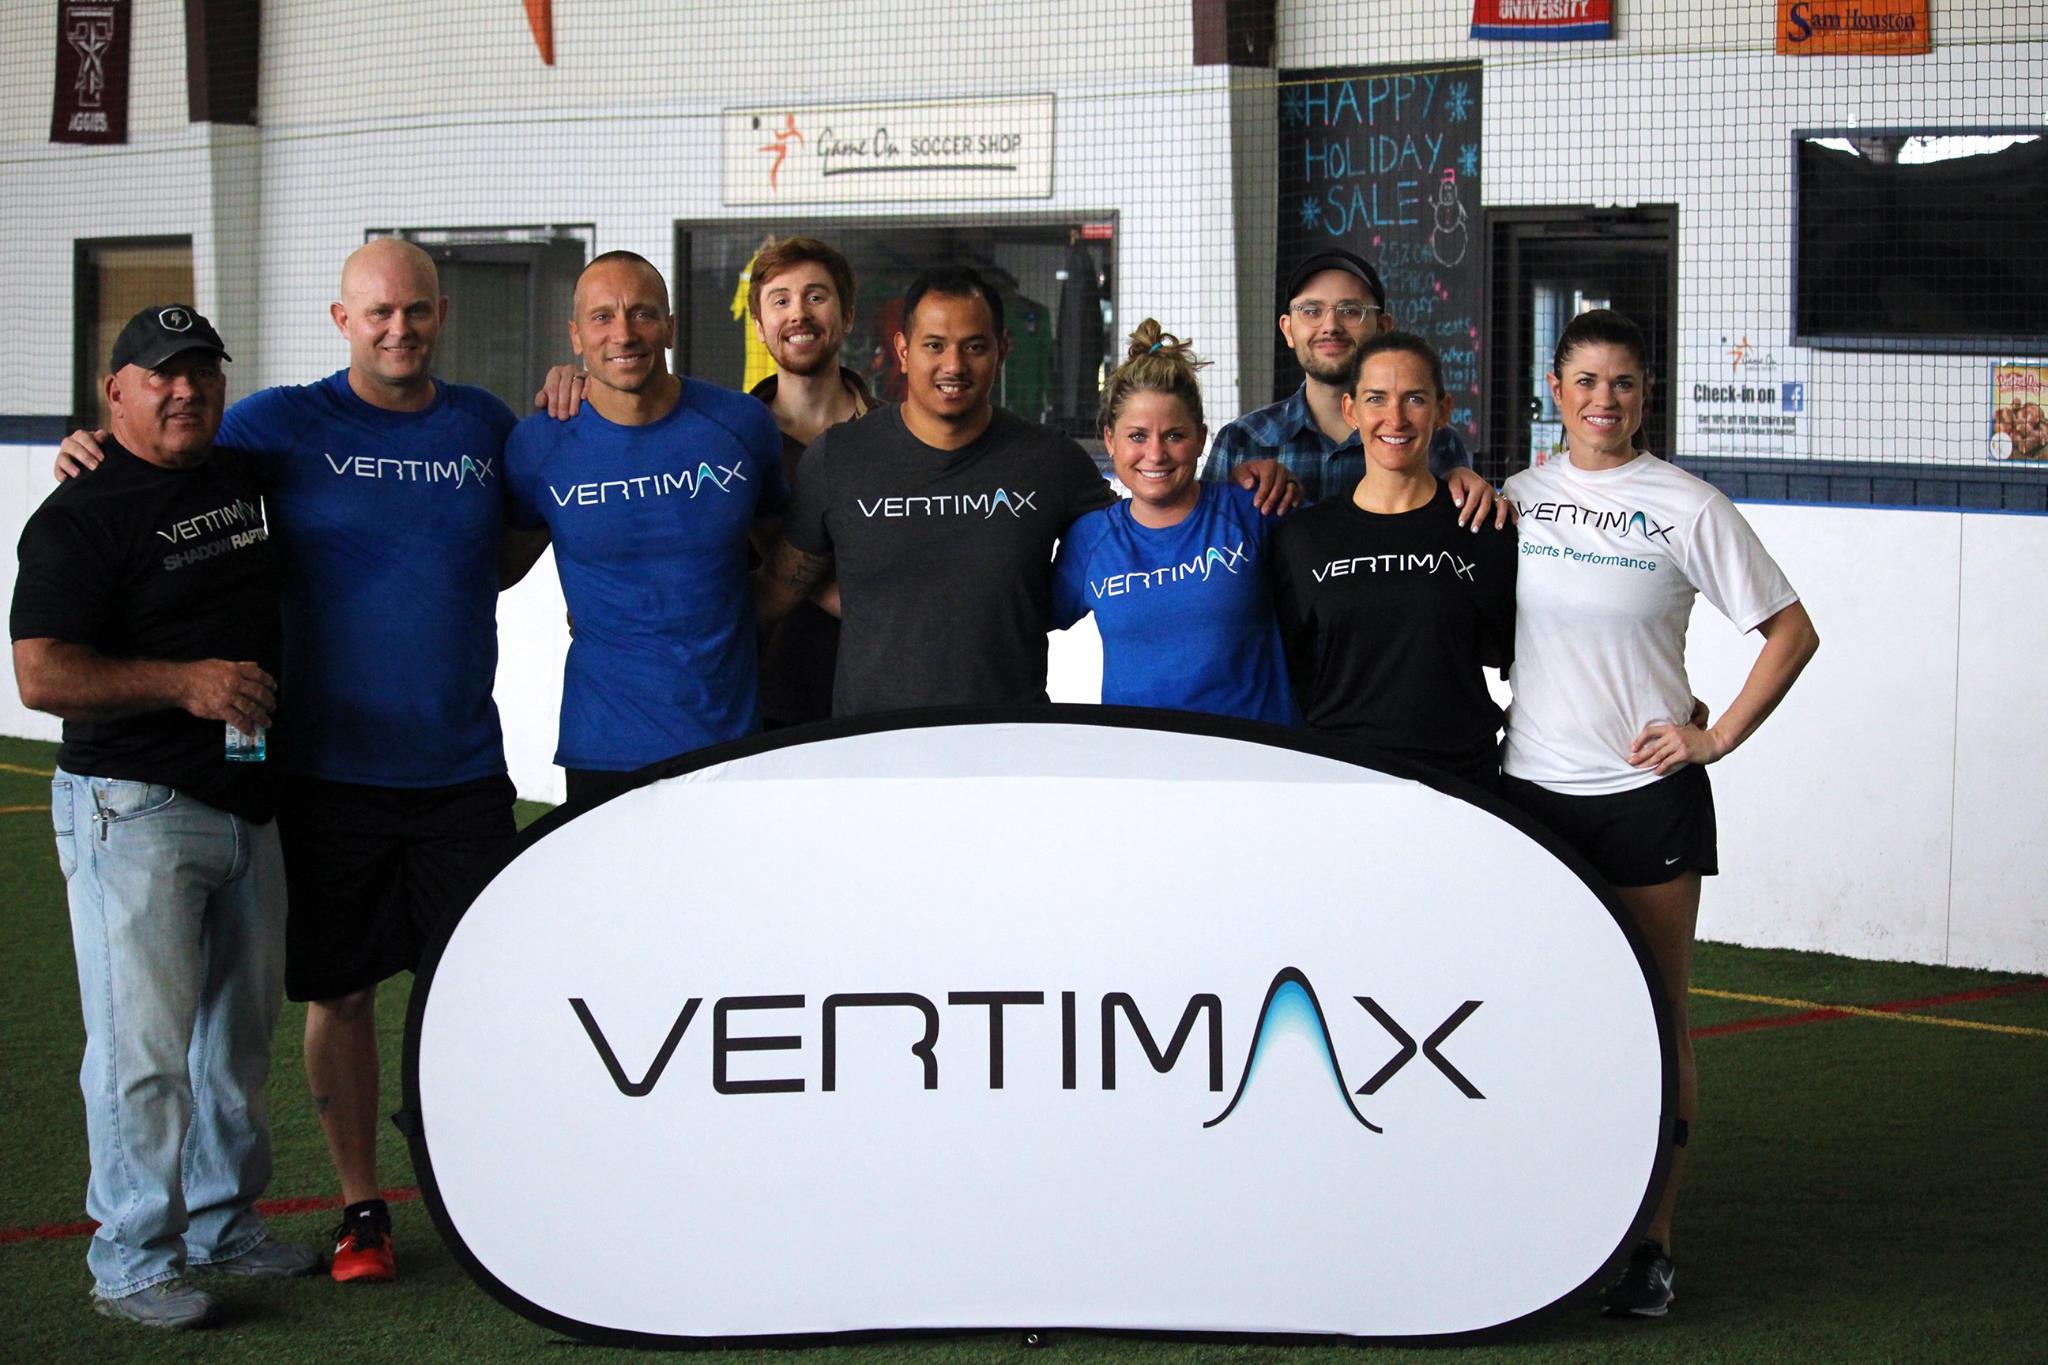 #vertimax trainers #certification